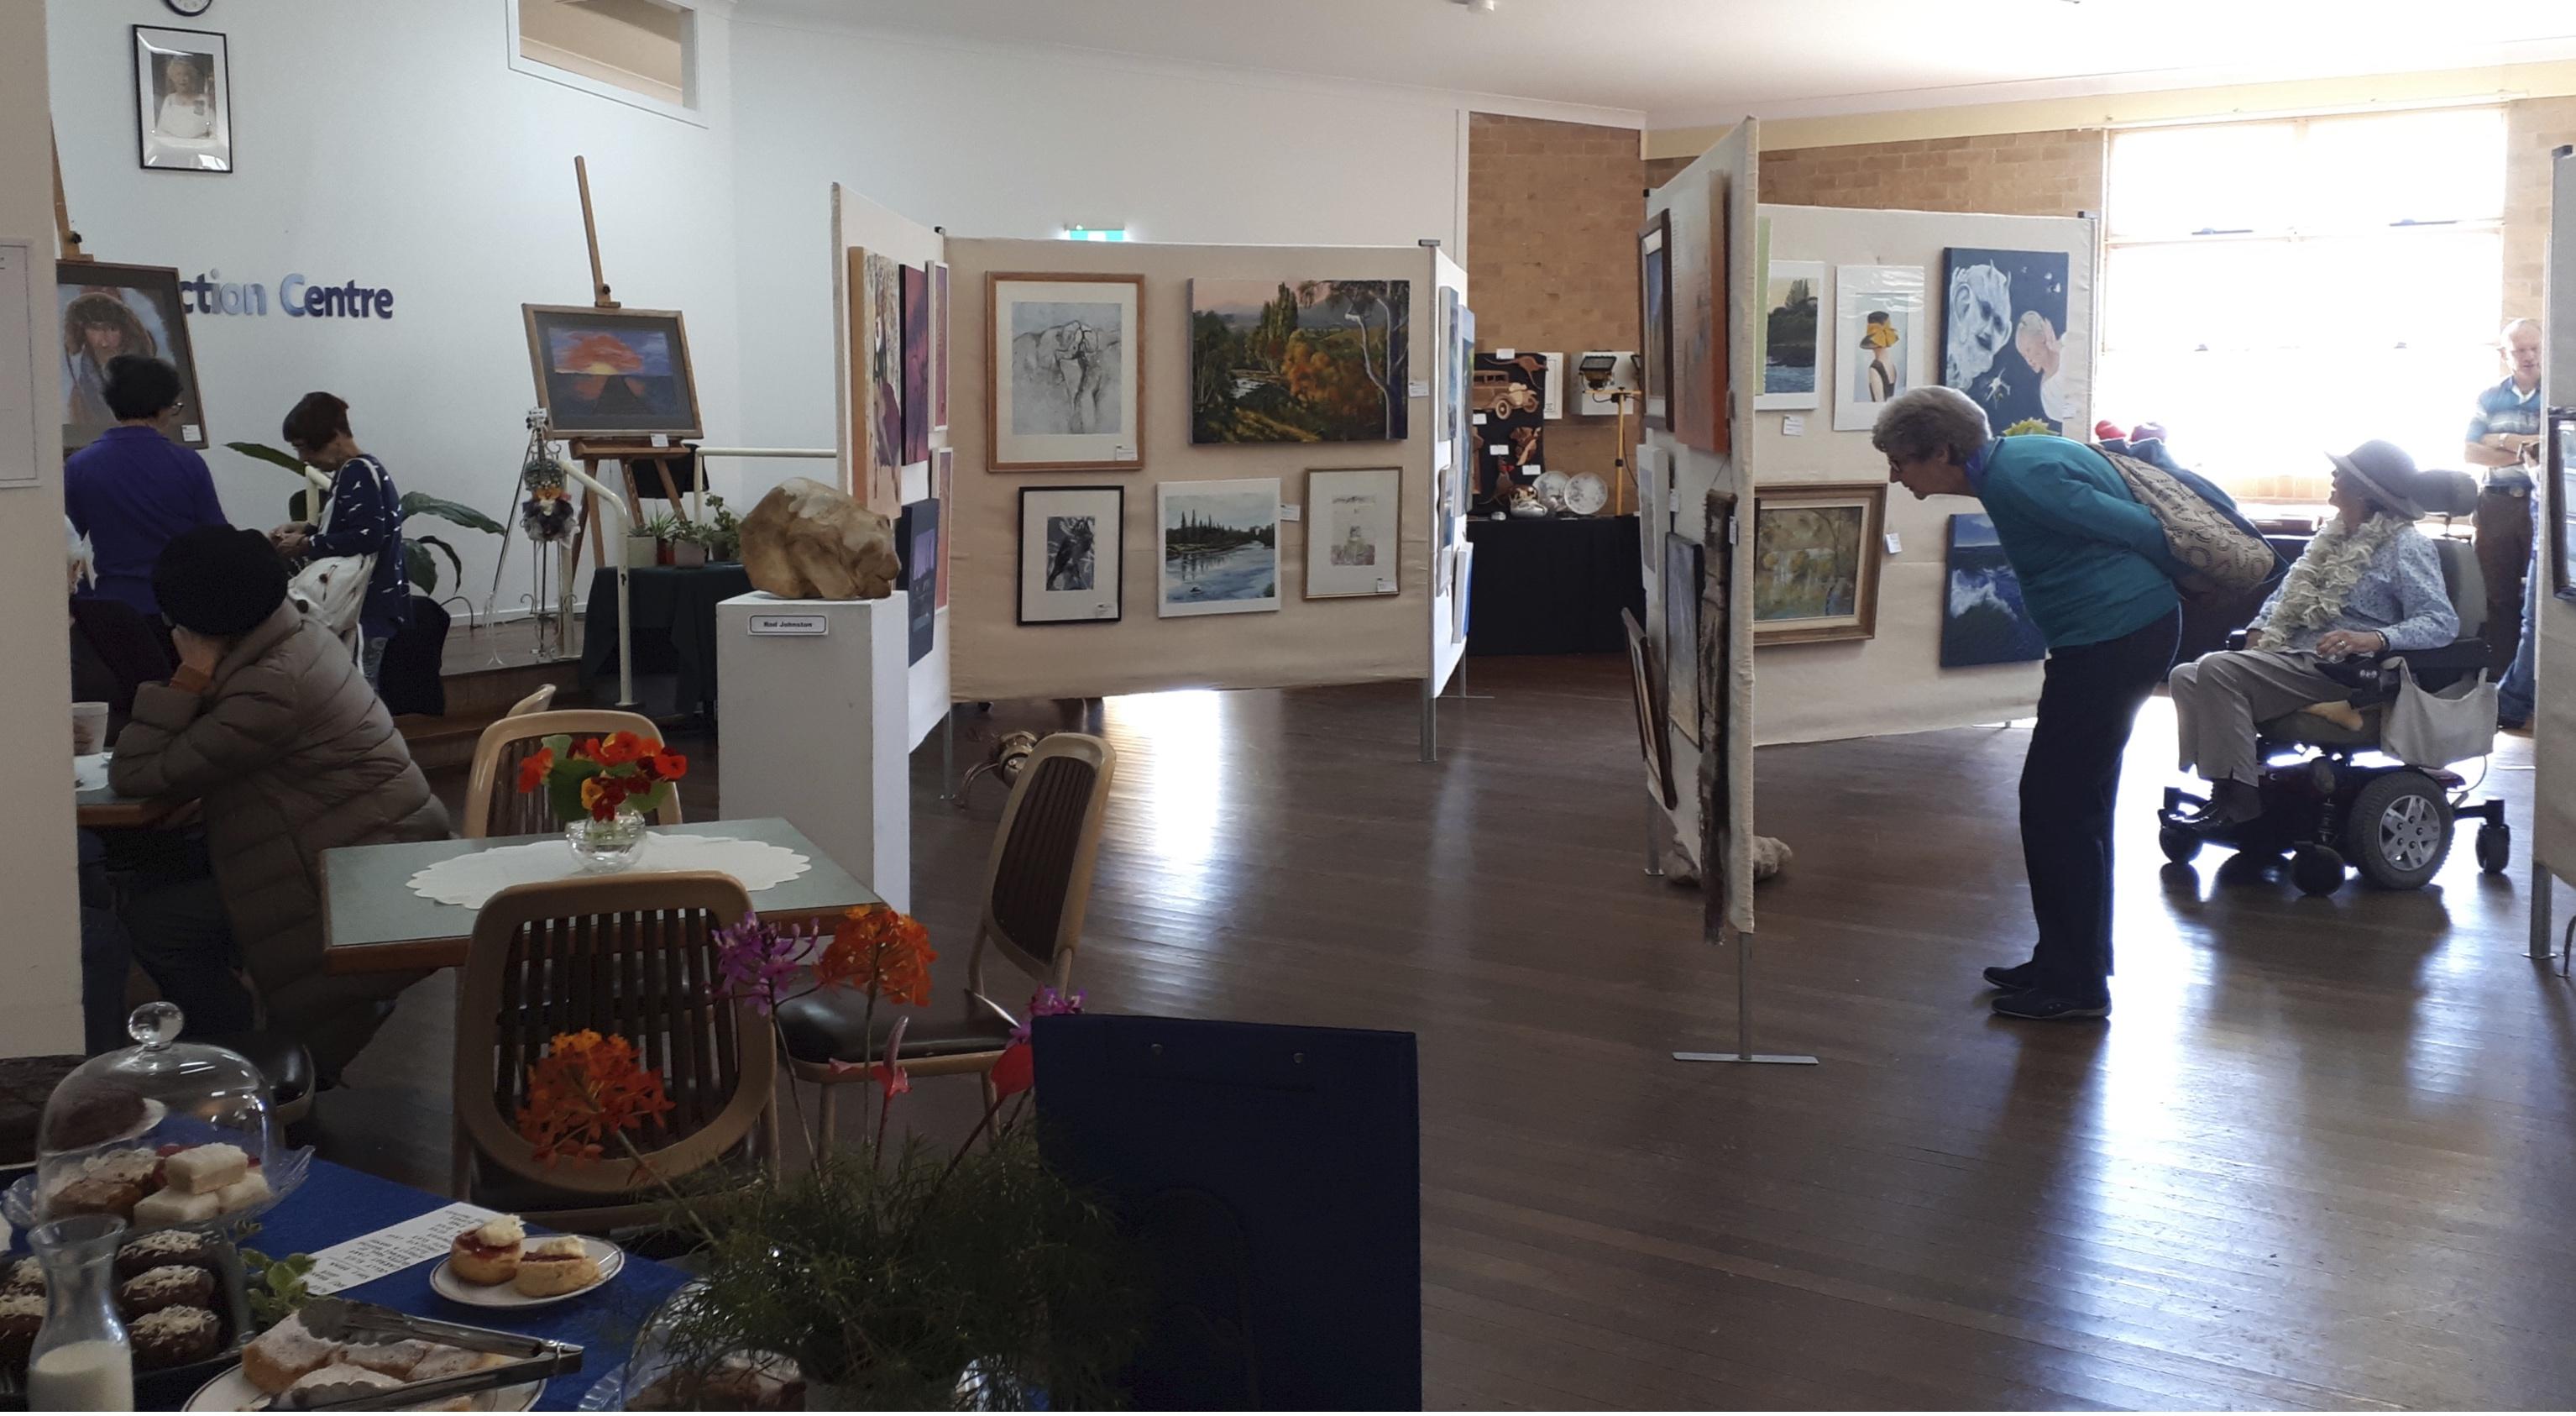 Art & Craft 310 Fantastic arts & crafts on display